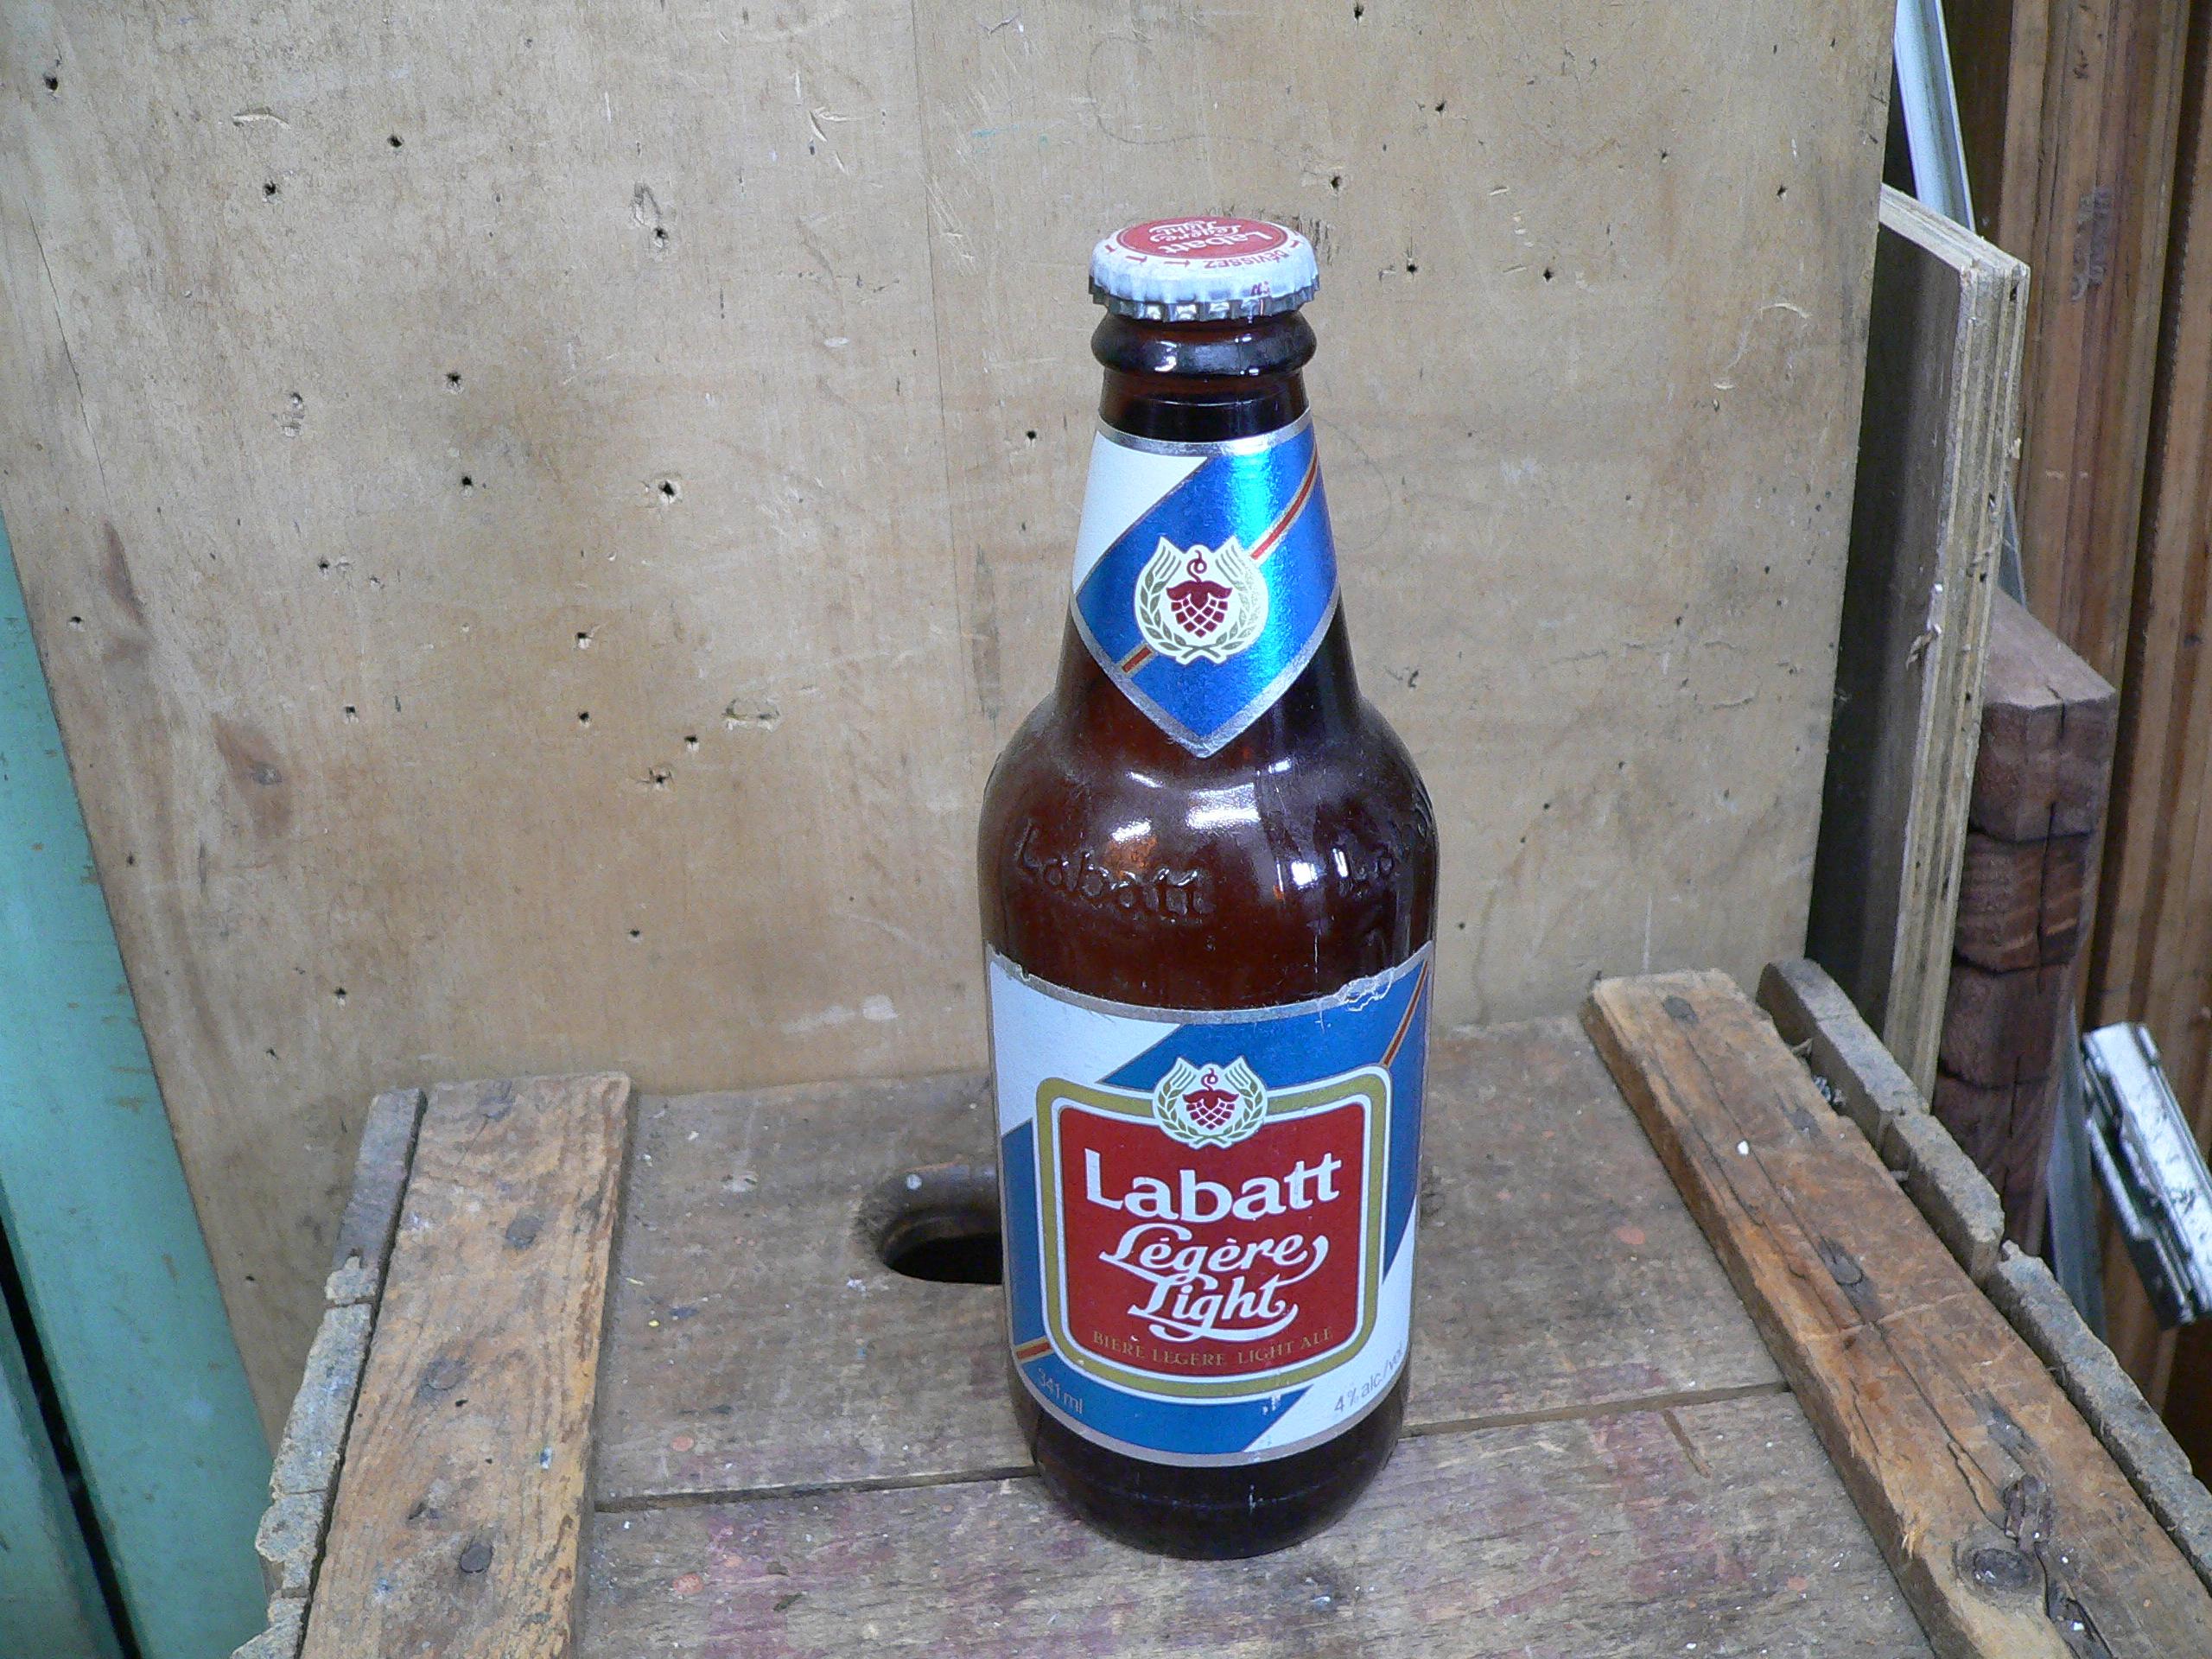 Bouteille bière labatt light # 6040.8